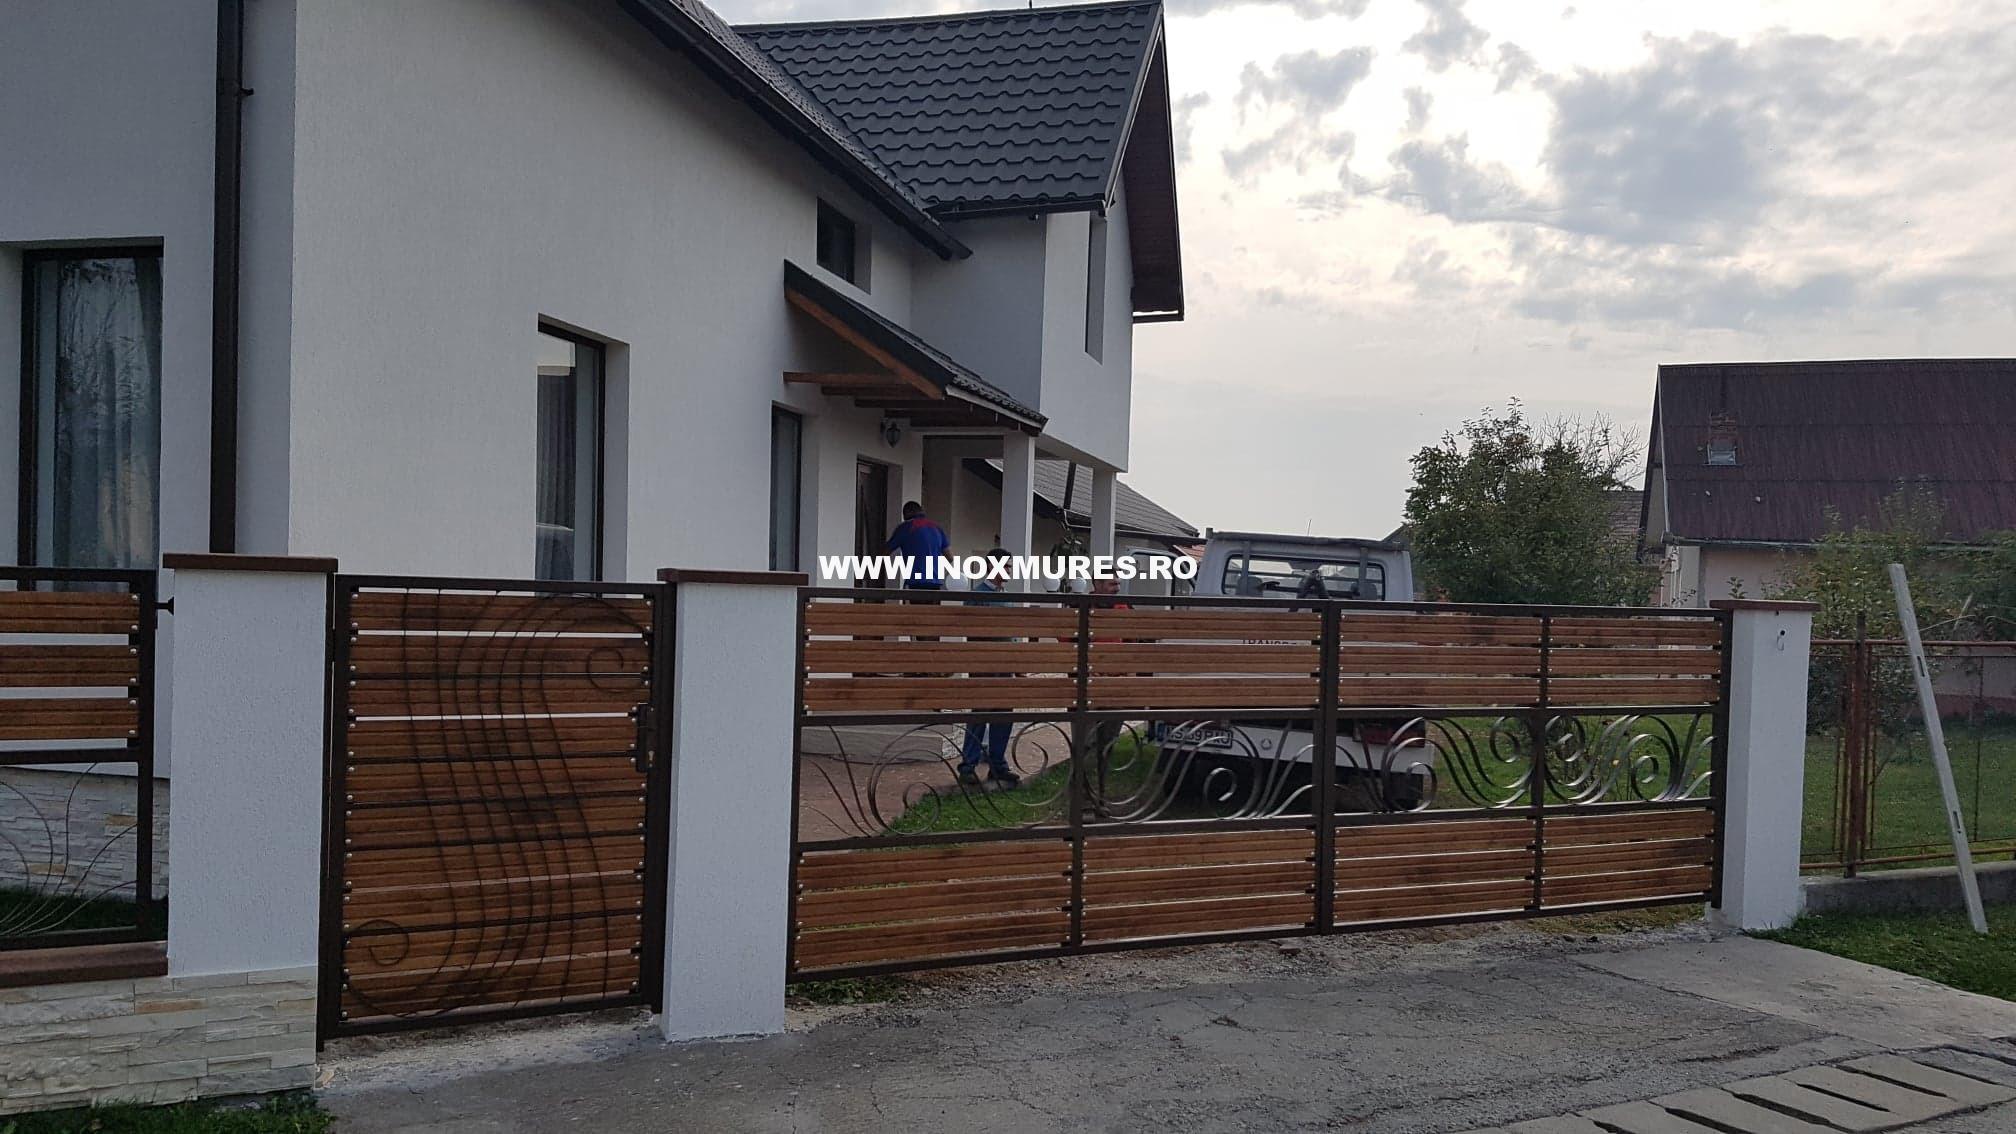 Gard din fier combinat cu lemn Rusi Munti, jud Mures 24.10.2018